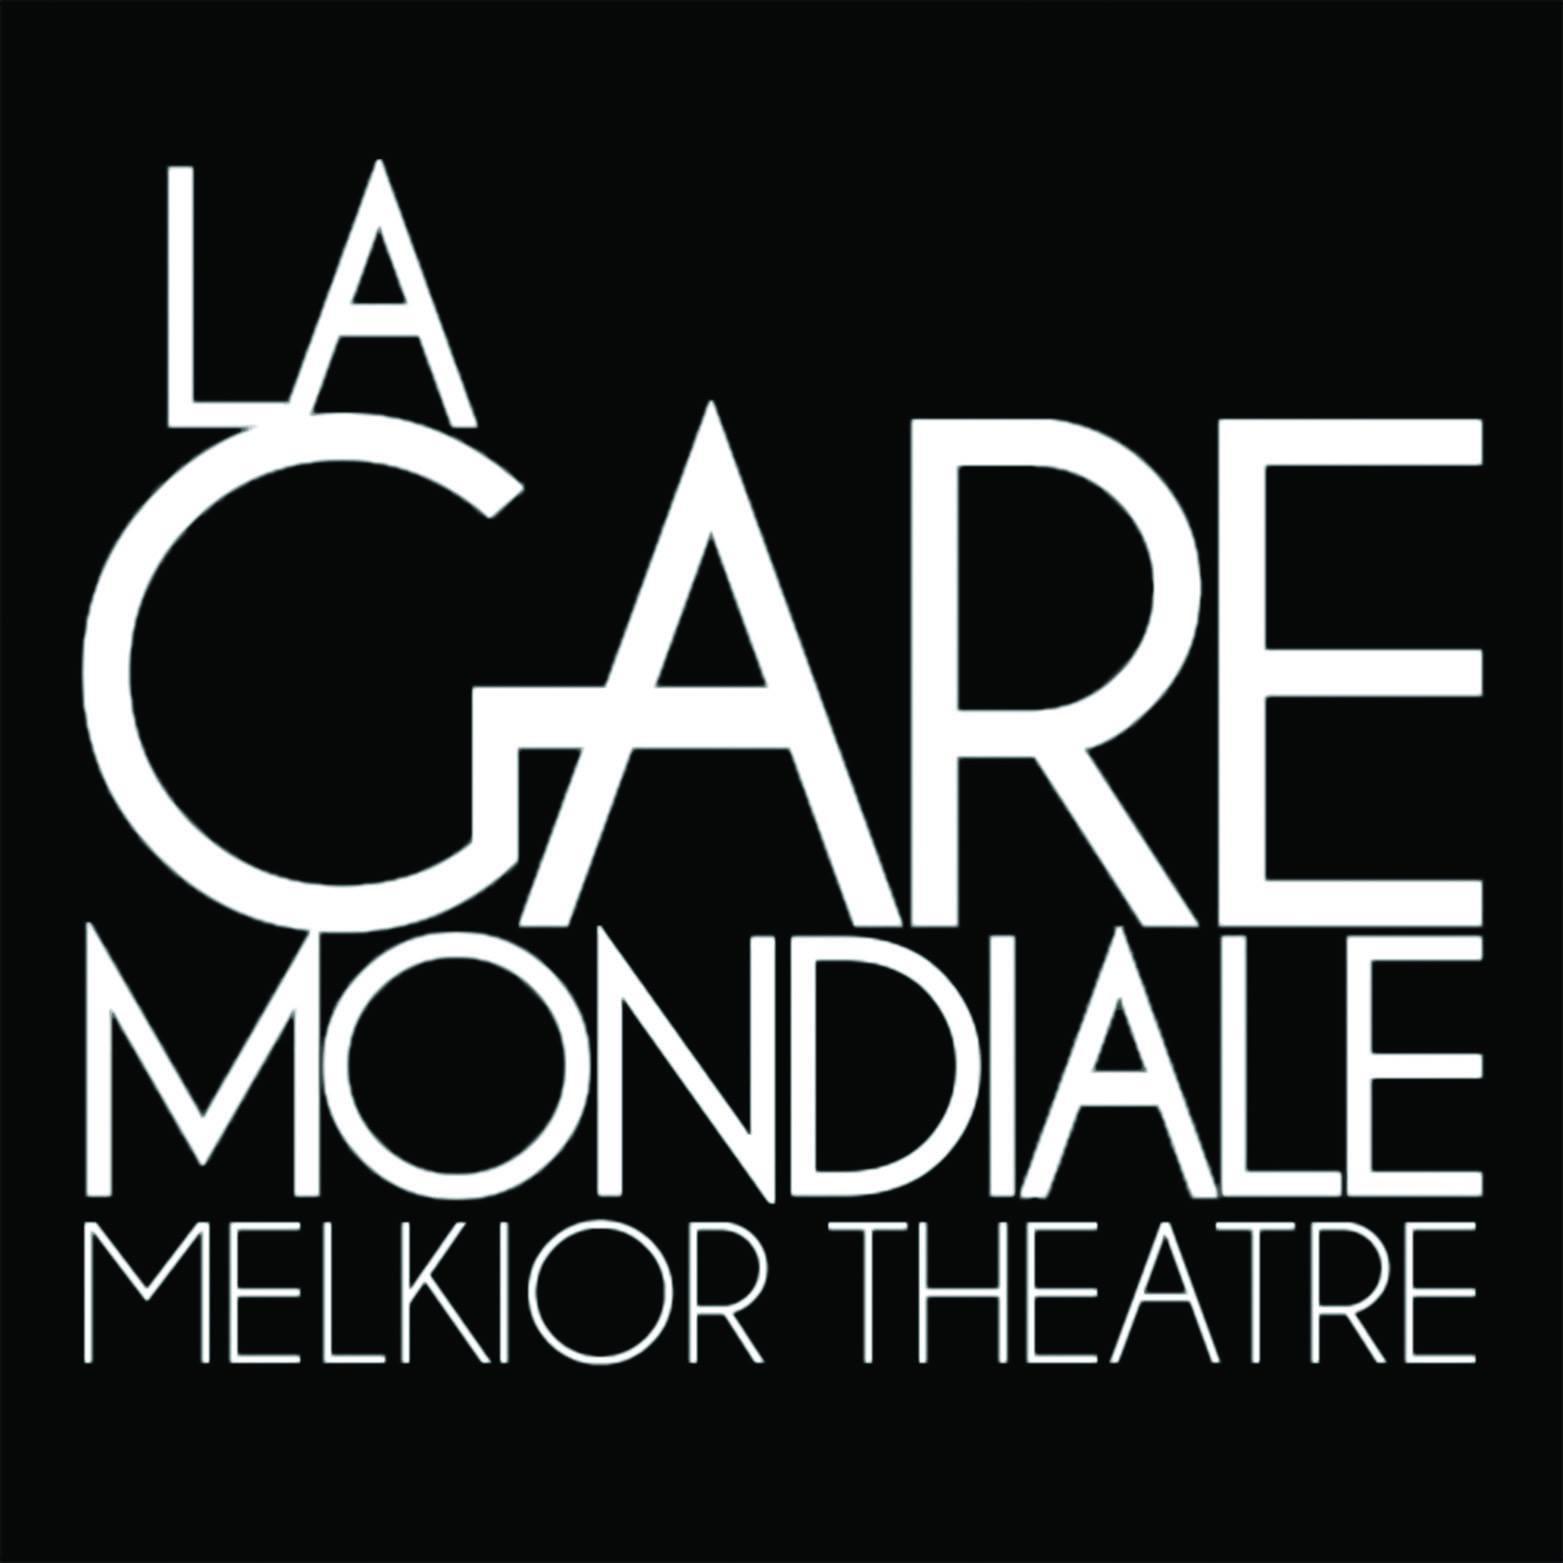 Best of Bergerac Agenda Festival TRAFIK 2021 LA Gare Mondiale Melkior Théâtre